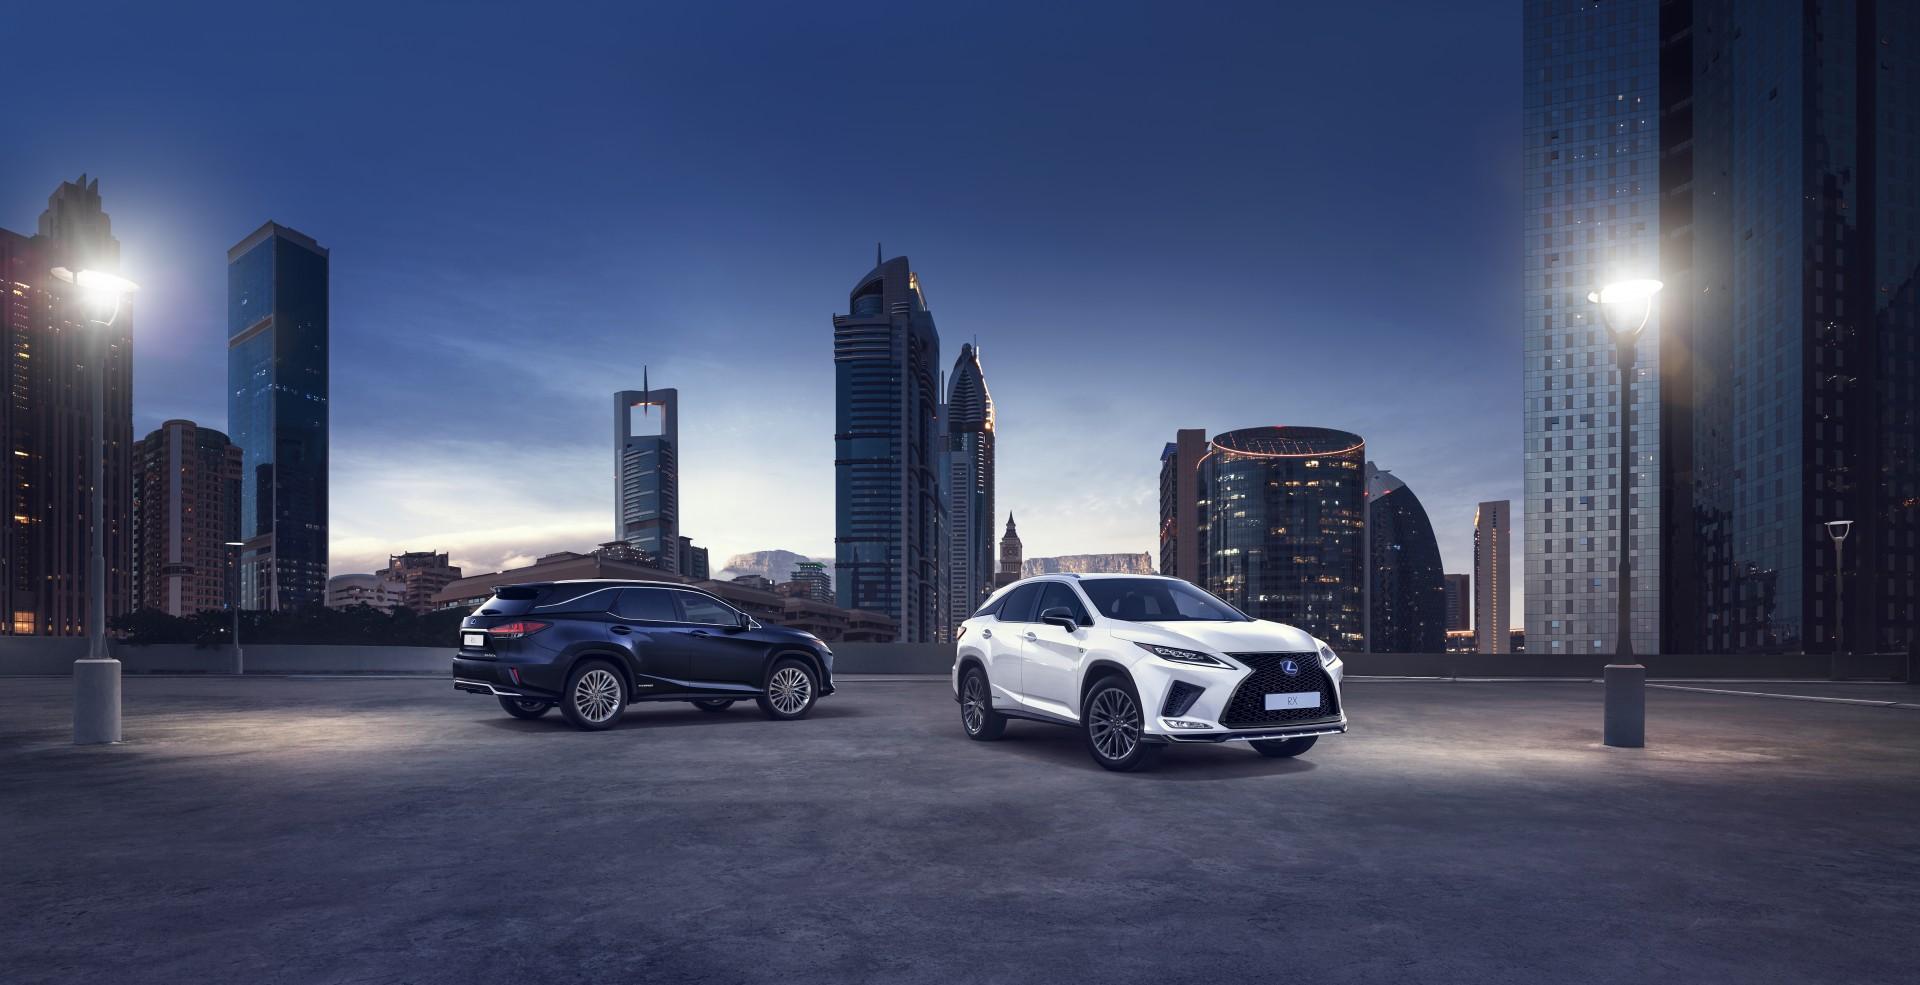 New Lexus Rx Makes World Debut